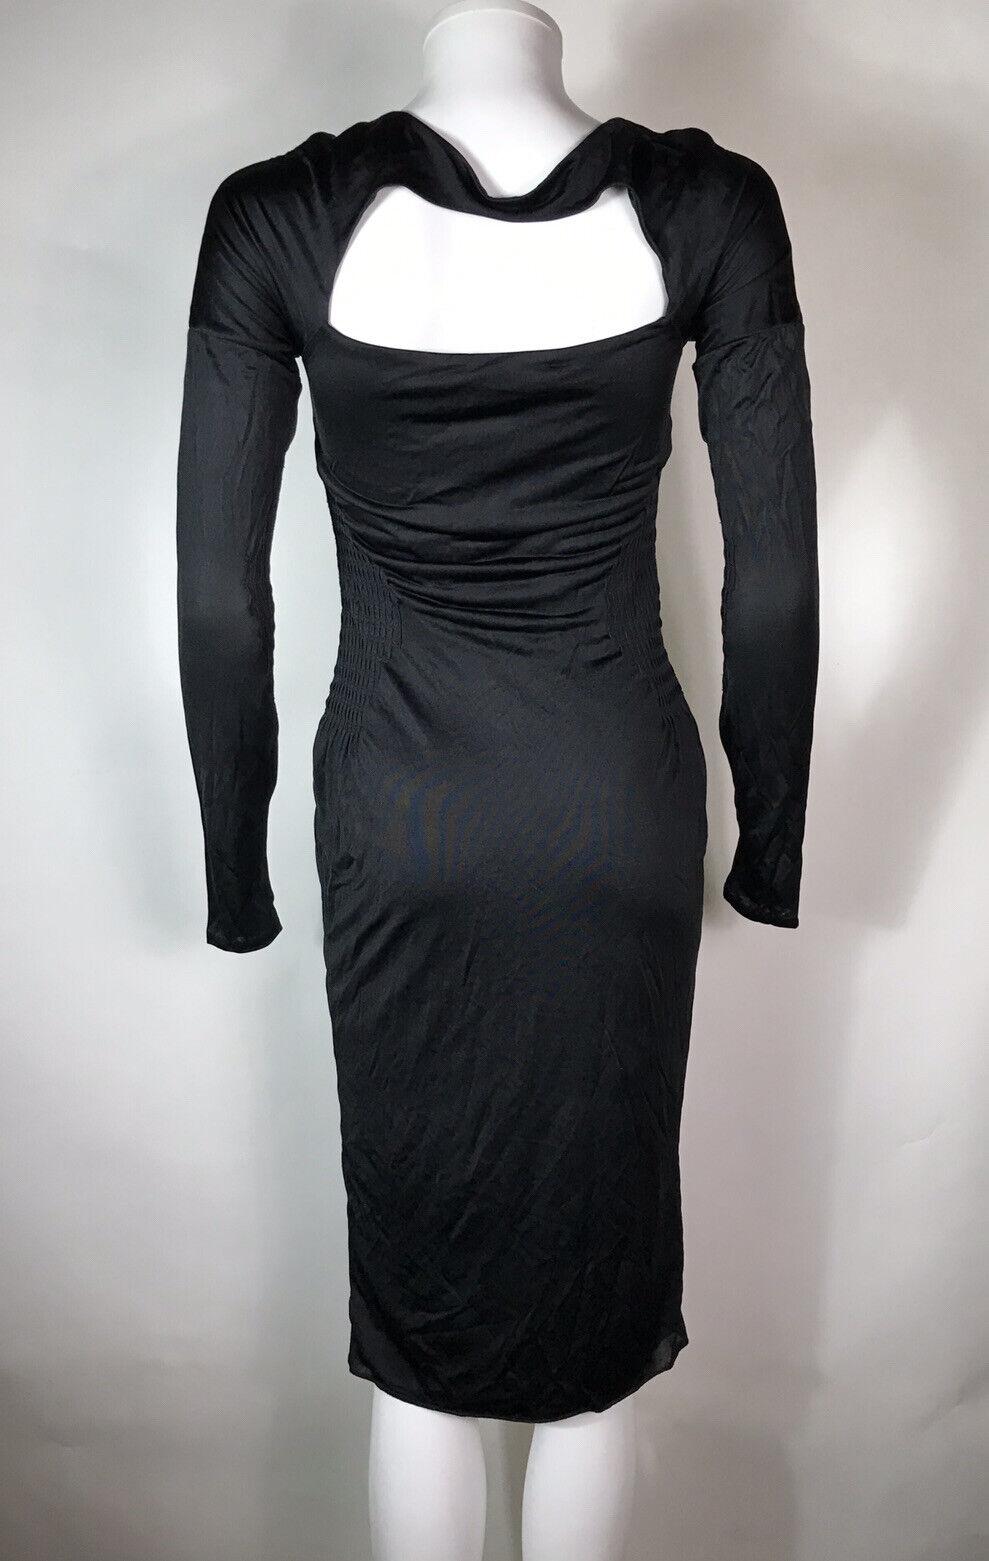 Rare Vtg Gucci Black Cut Out Dress S - image 6